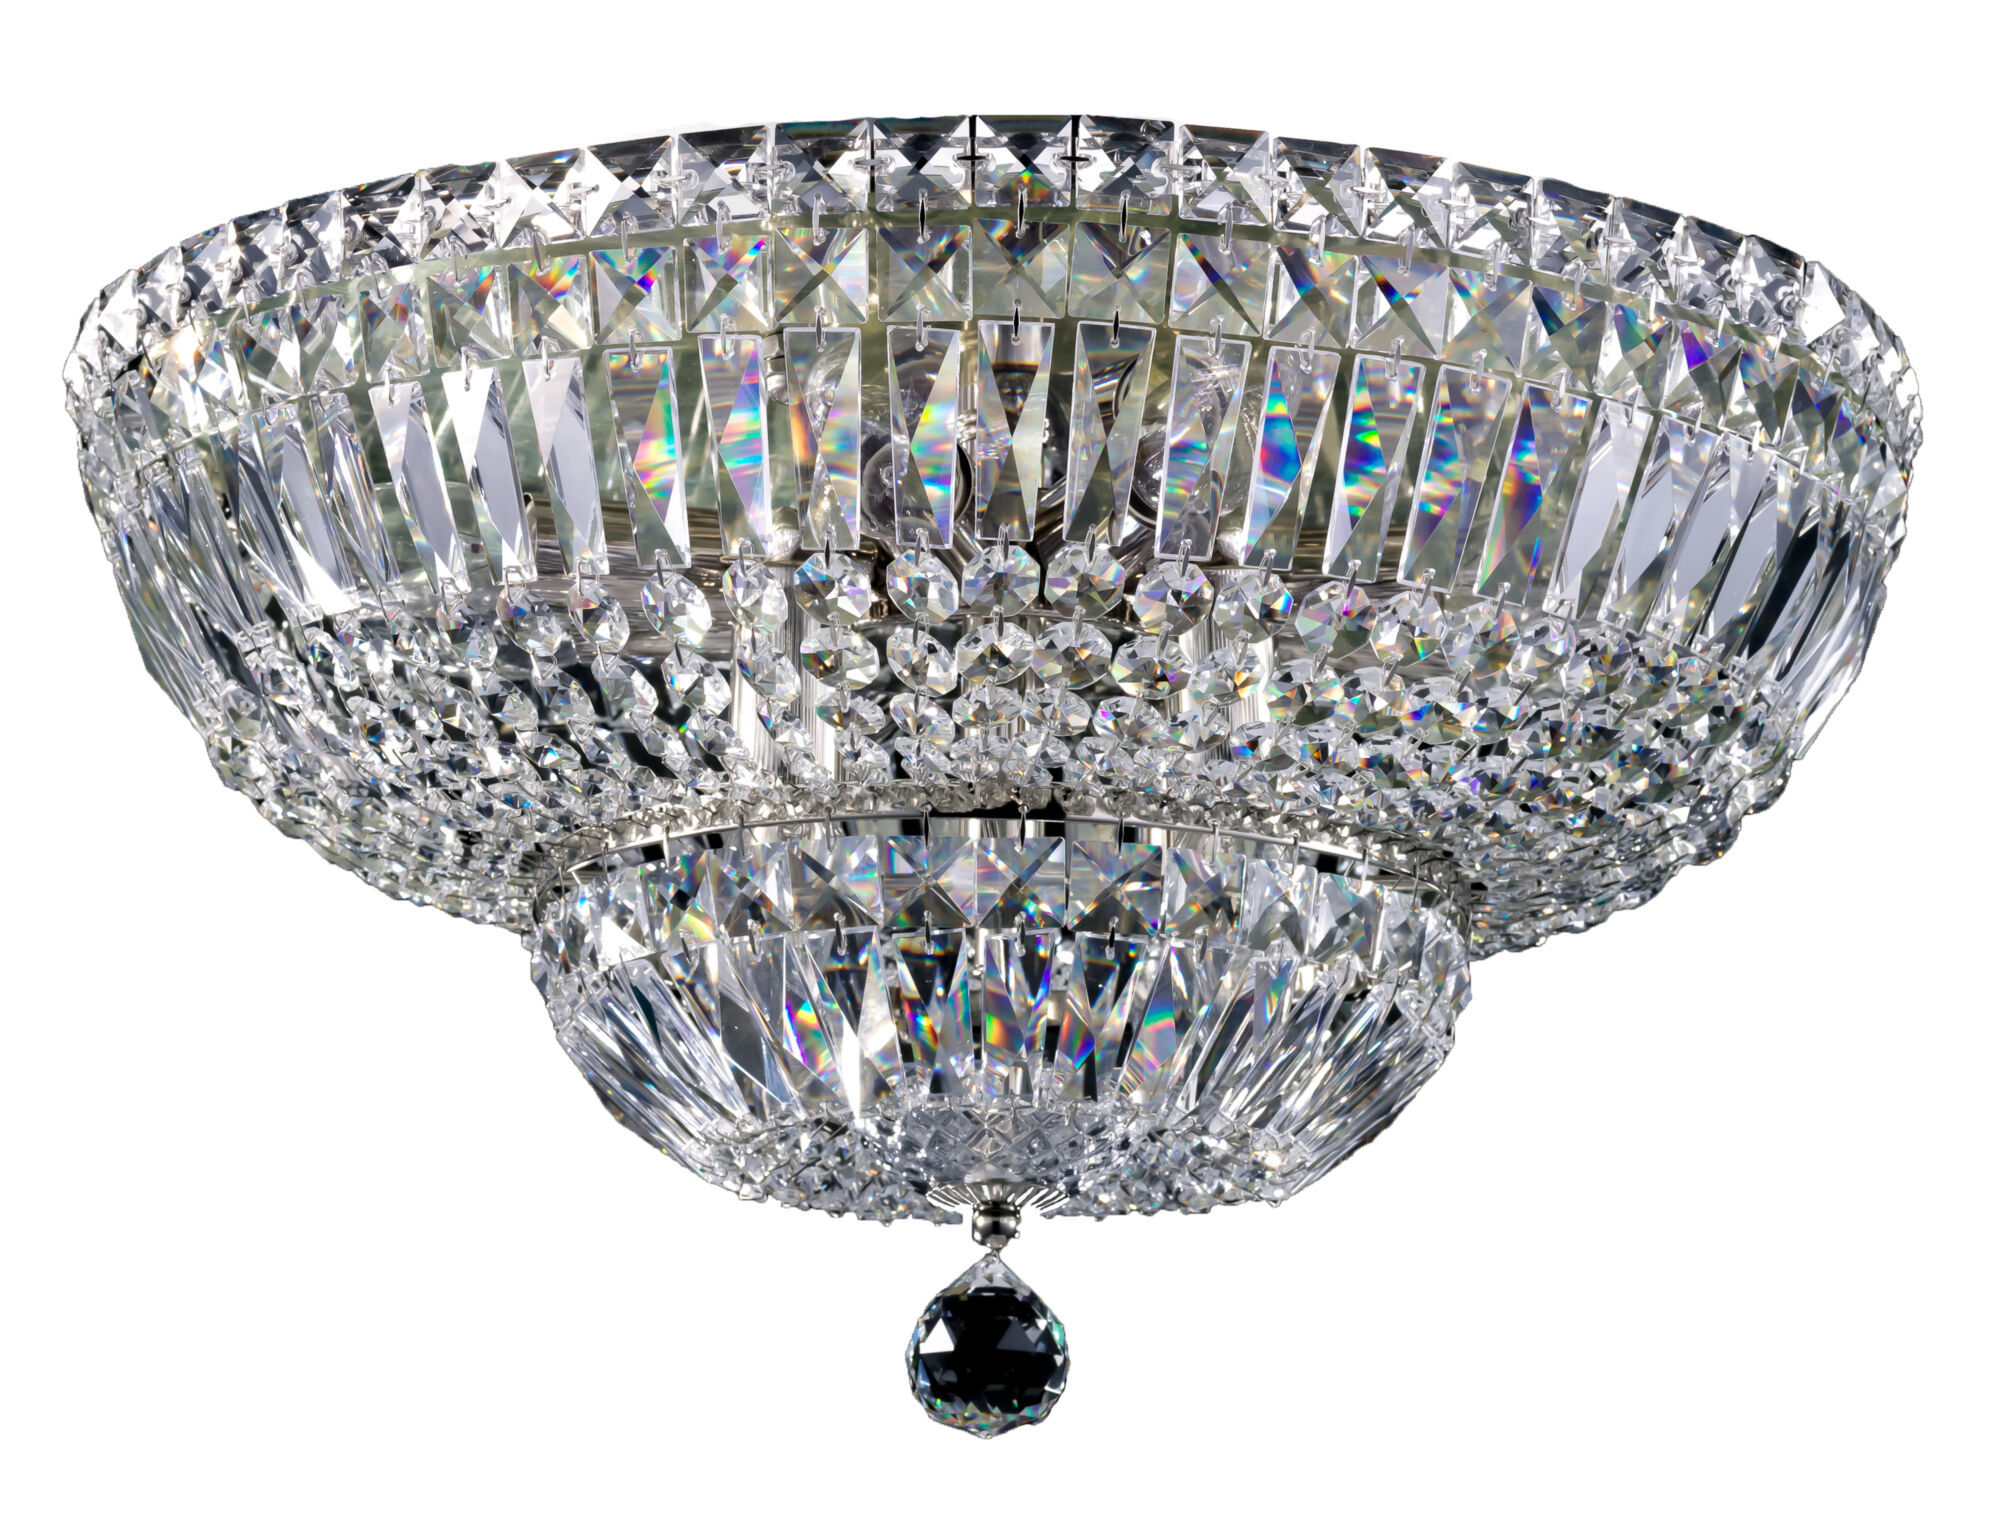 Потолочная люстра Maytoni Basfor DIA100-CL-12-N (C100-PT45-N), 12xE14x60W, никель, прозрачный, металл, хрусталь - фото 1